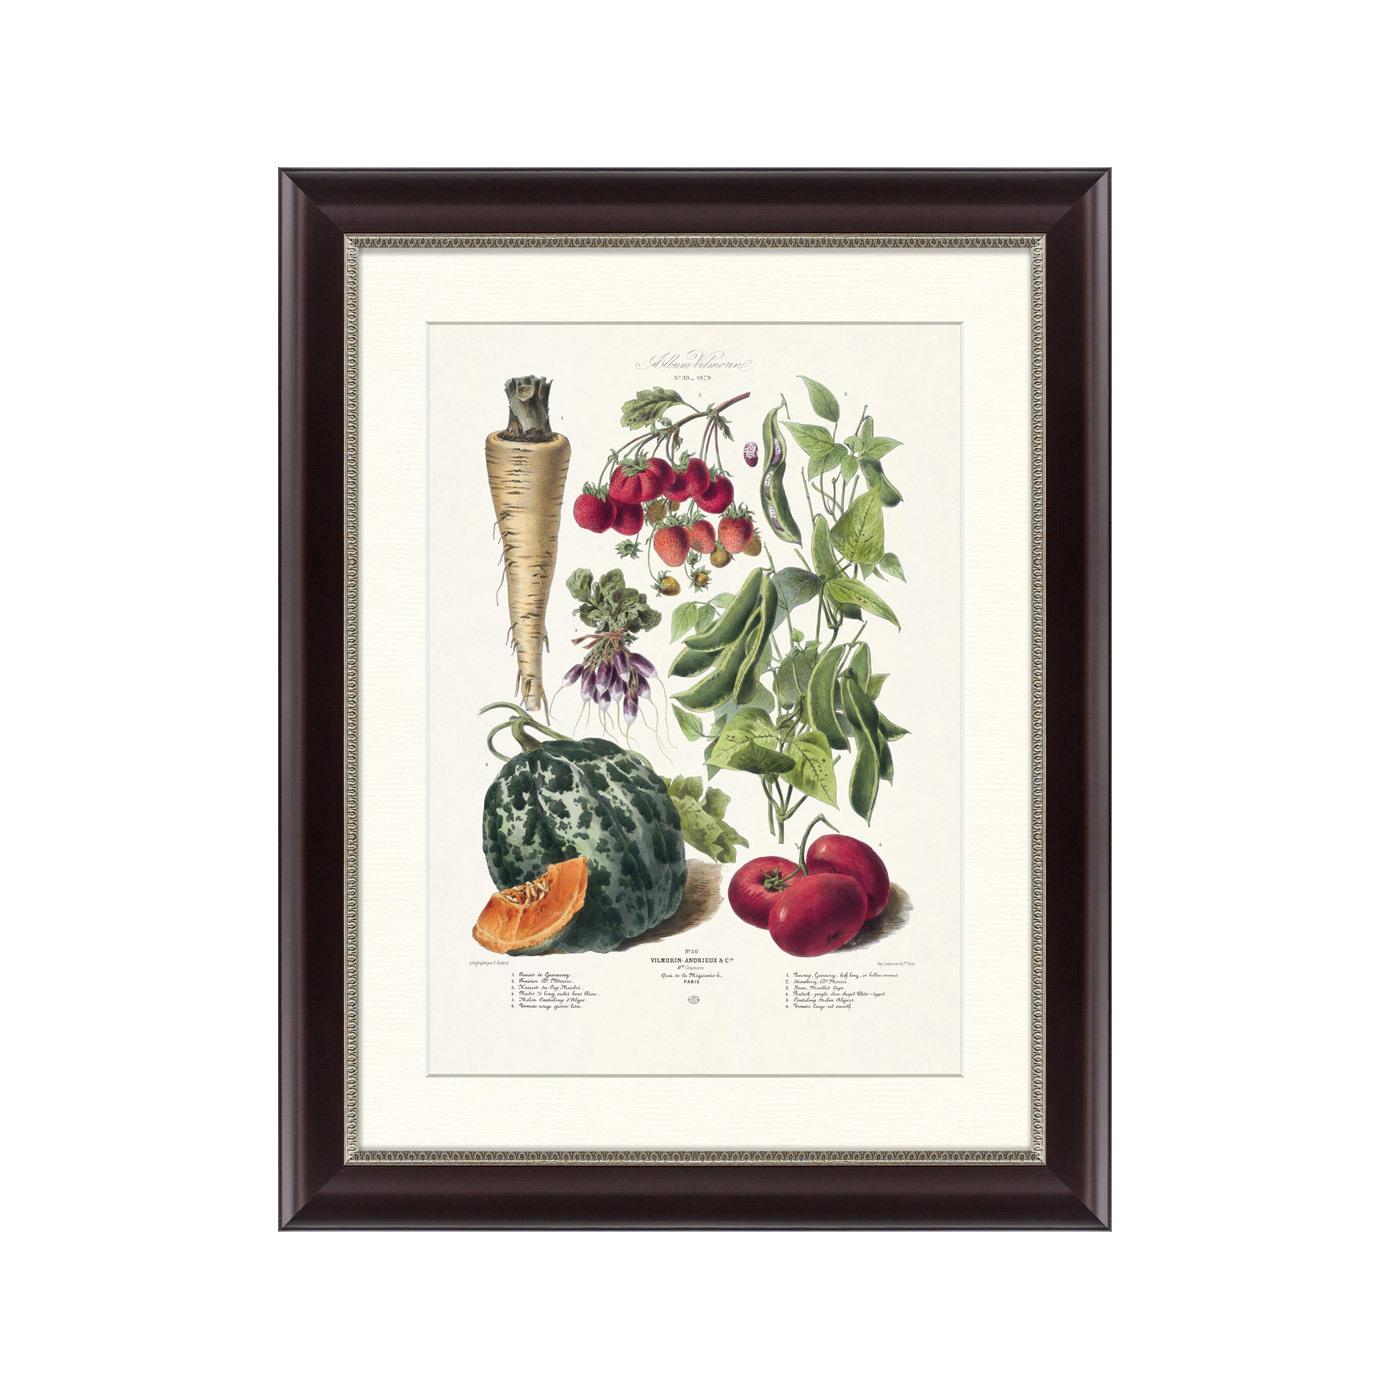 {} Картины в Квартиру Картина Vilmorin Andrieux & Cie, Альбом №30 (47х60 см) картины в квартиру картина пилигрим из мешхеда 47х60 см